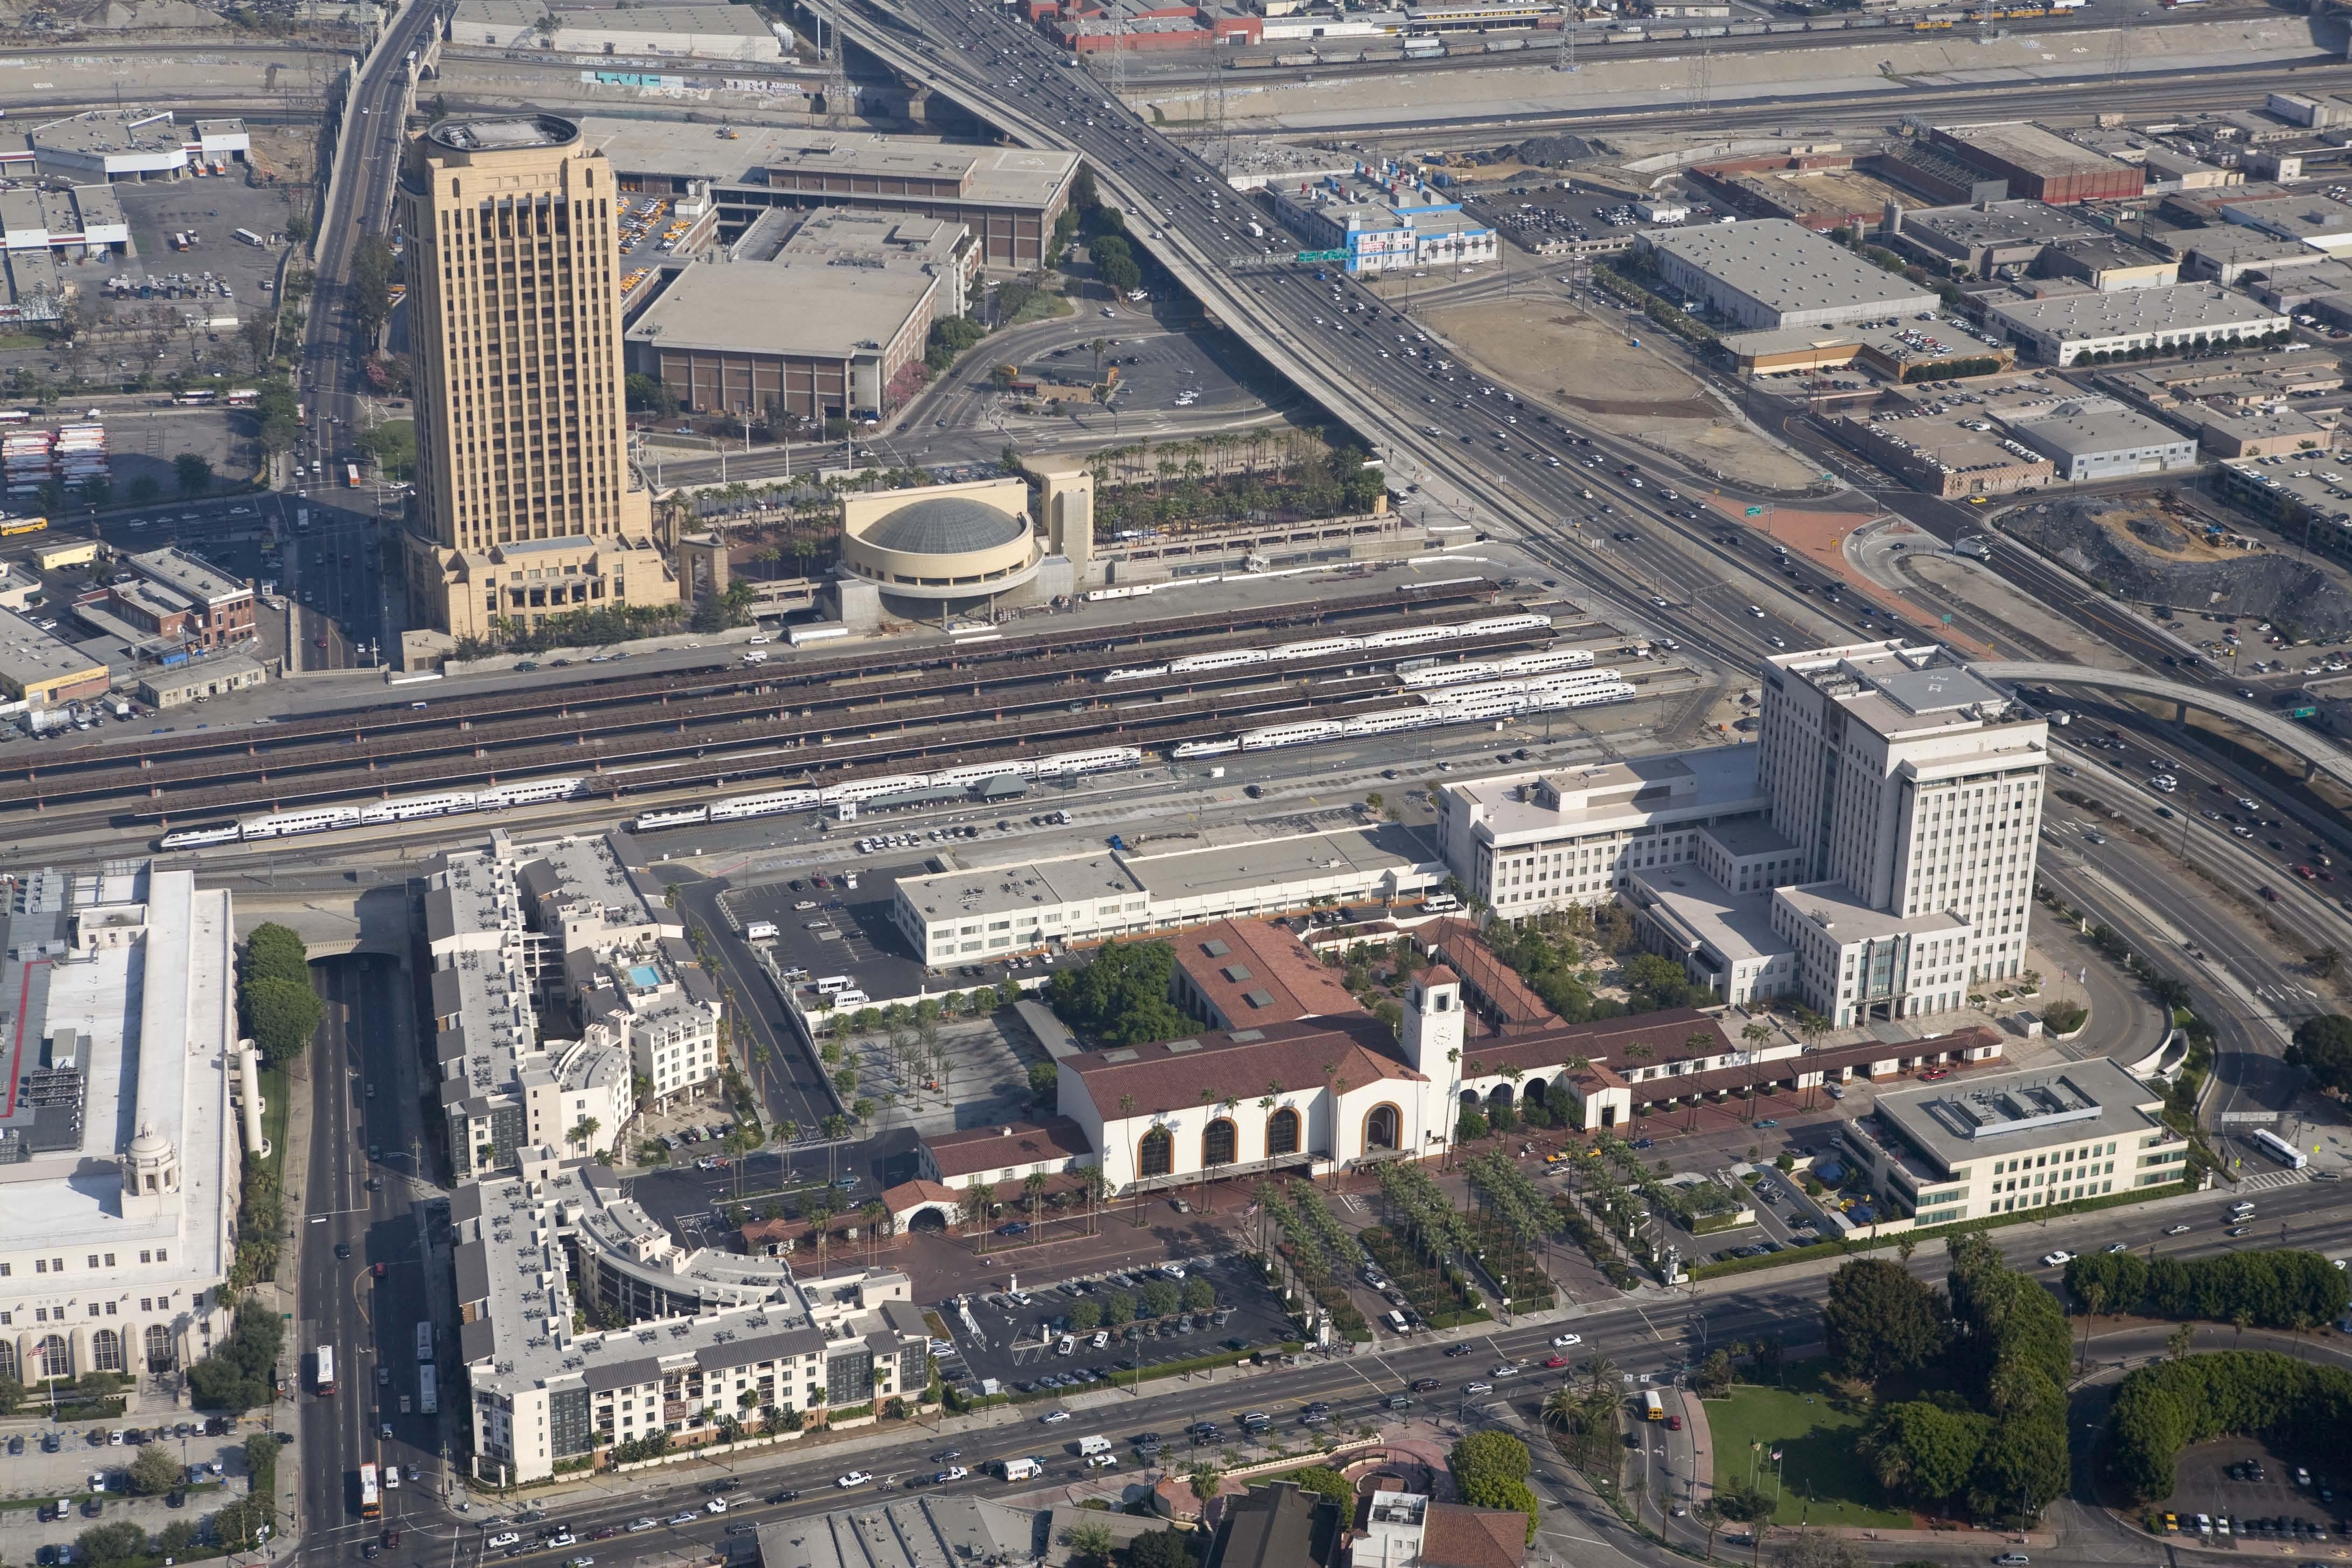 "<p>Aerial ofUnion Station</p> <p><span style=""font-family: Verdana, Geneva, sans-serif; line-height: 20px; font-size: small;"">Photograph Courtesy of Cattelus © 2011</span></p>"